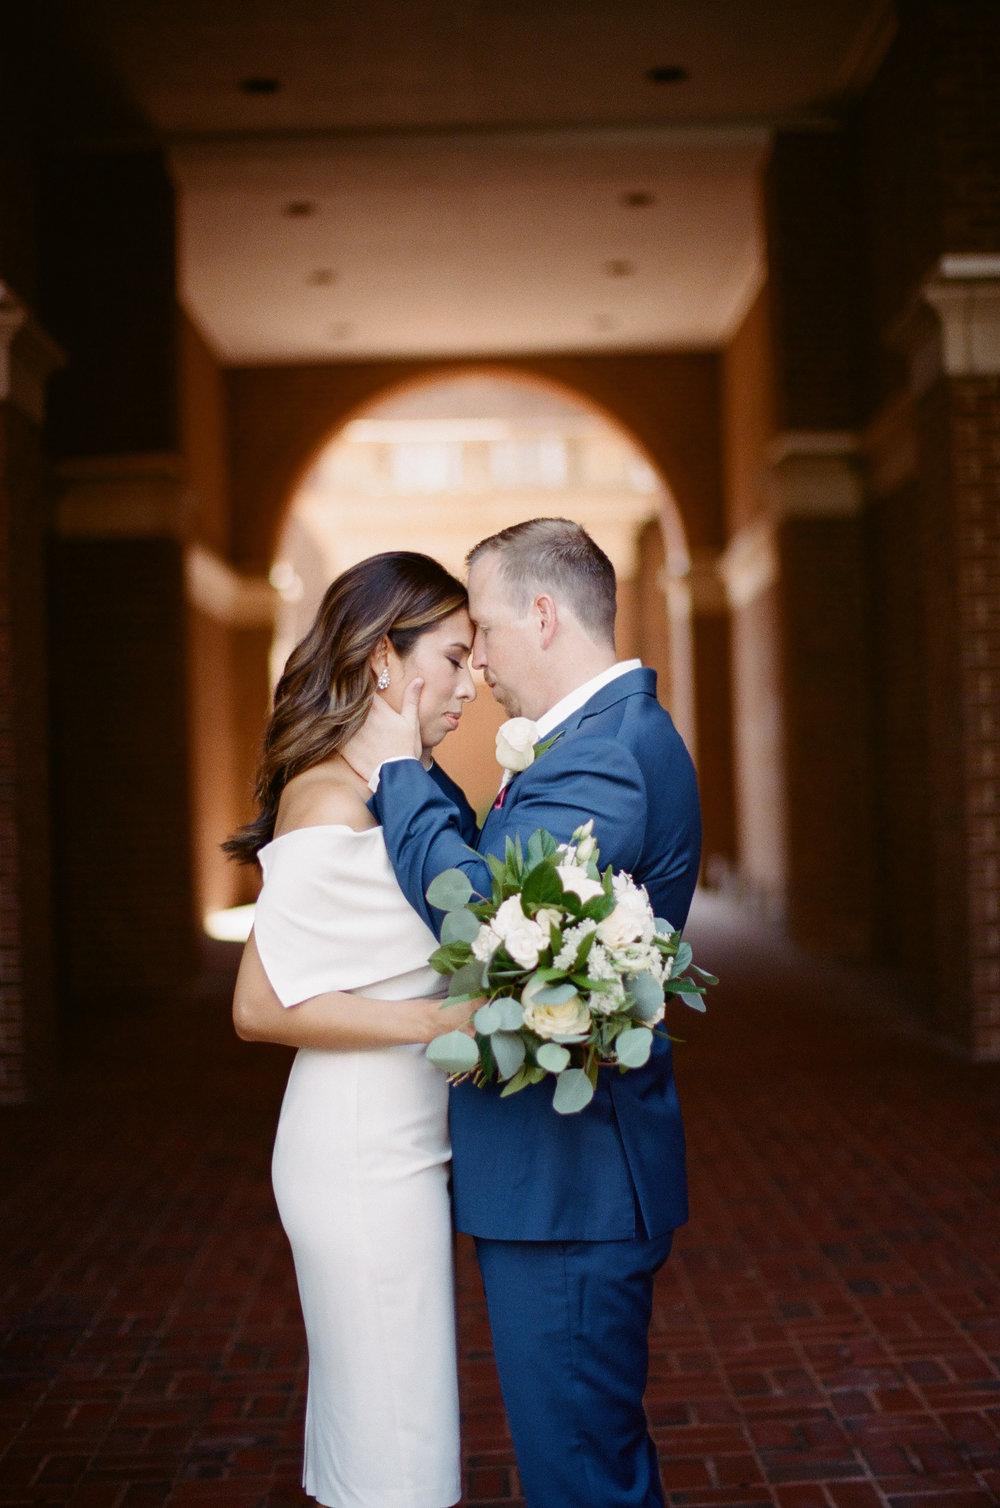 DANILE & JESSICA | DOWNTOWN ALEXANDIRA, VA